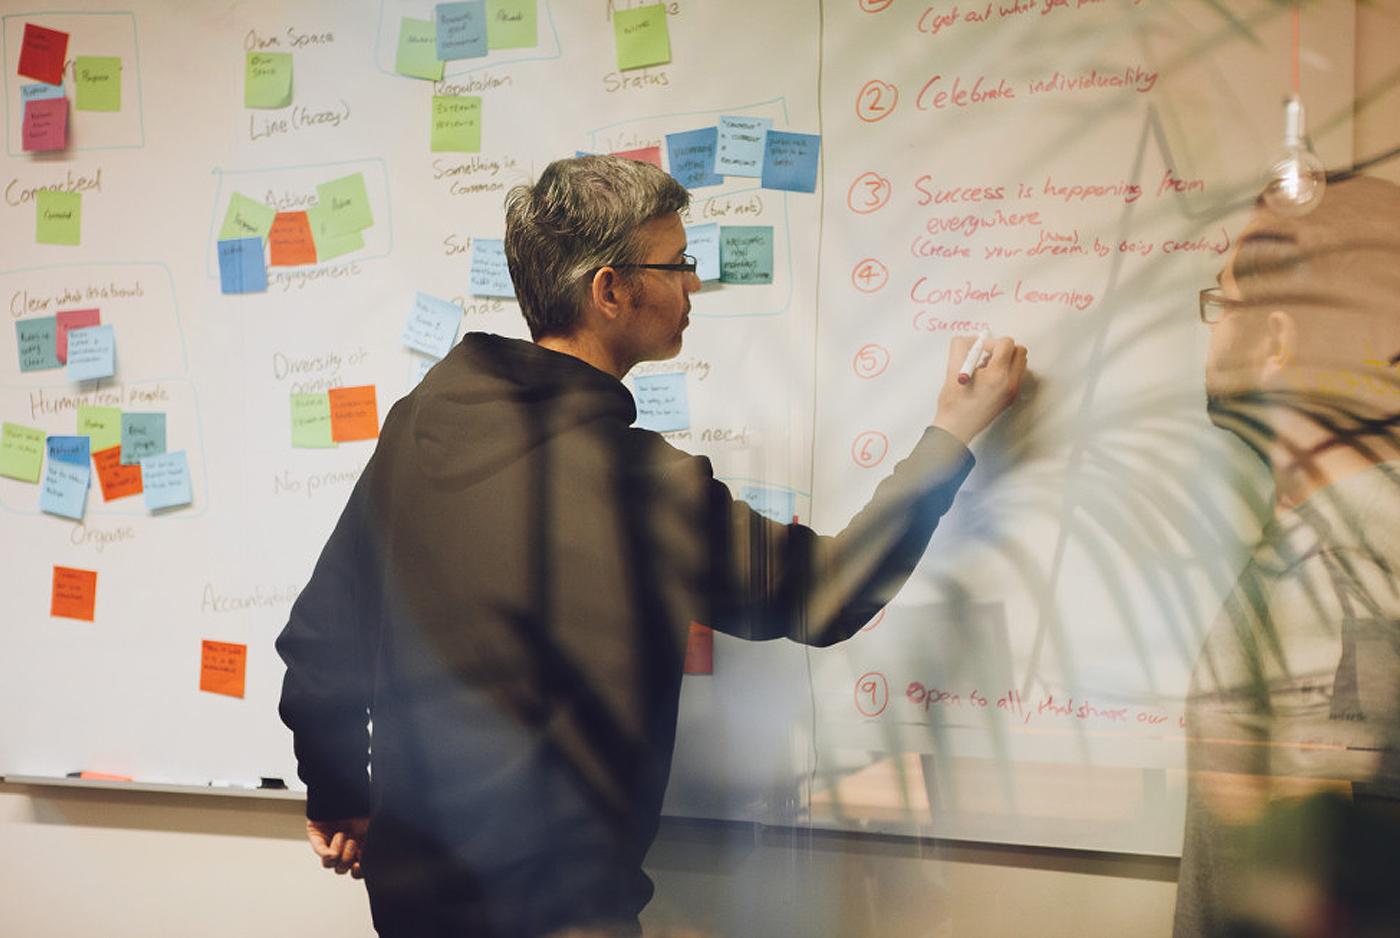 The product designer's practice